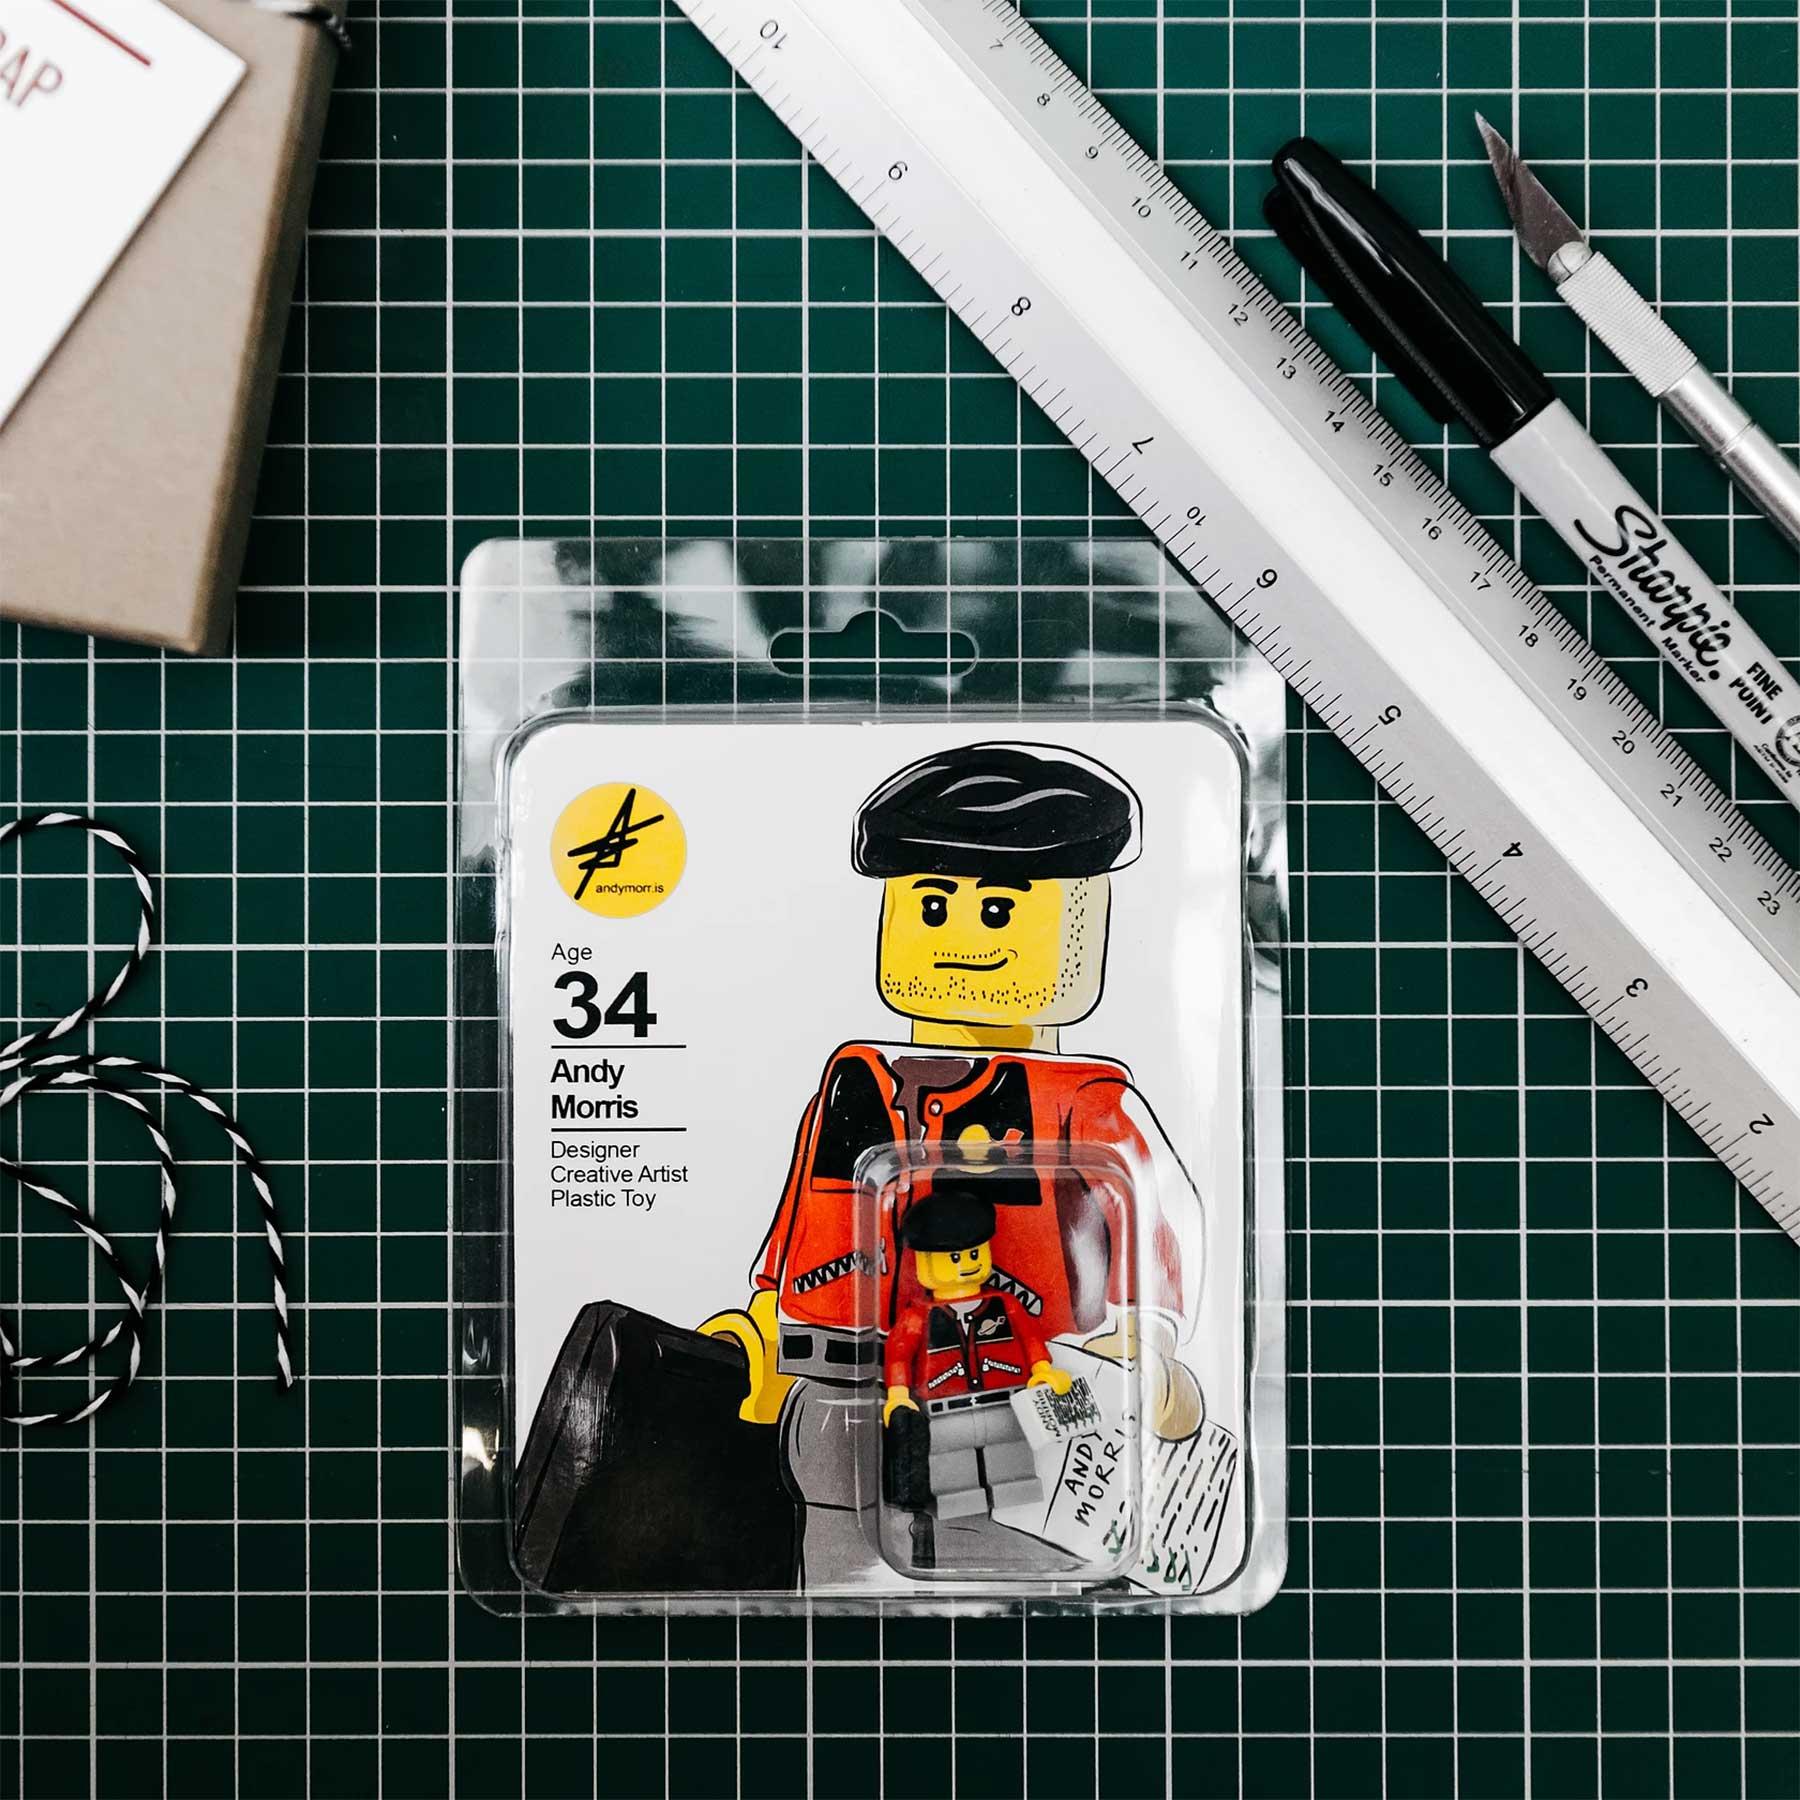 Bewerbung per LEGO-Minifigure Bewerbung-per-LEGOfigur_03